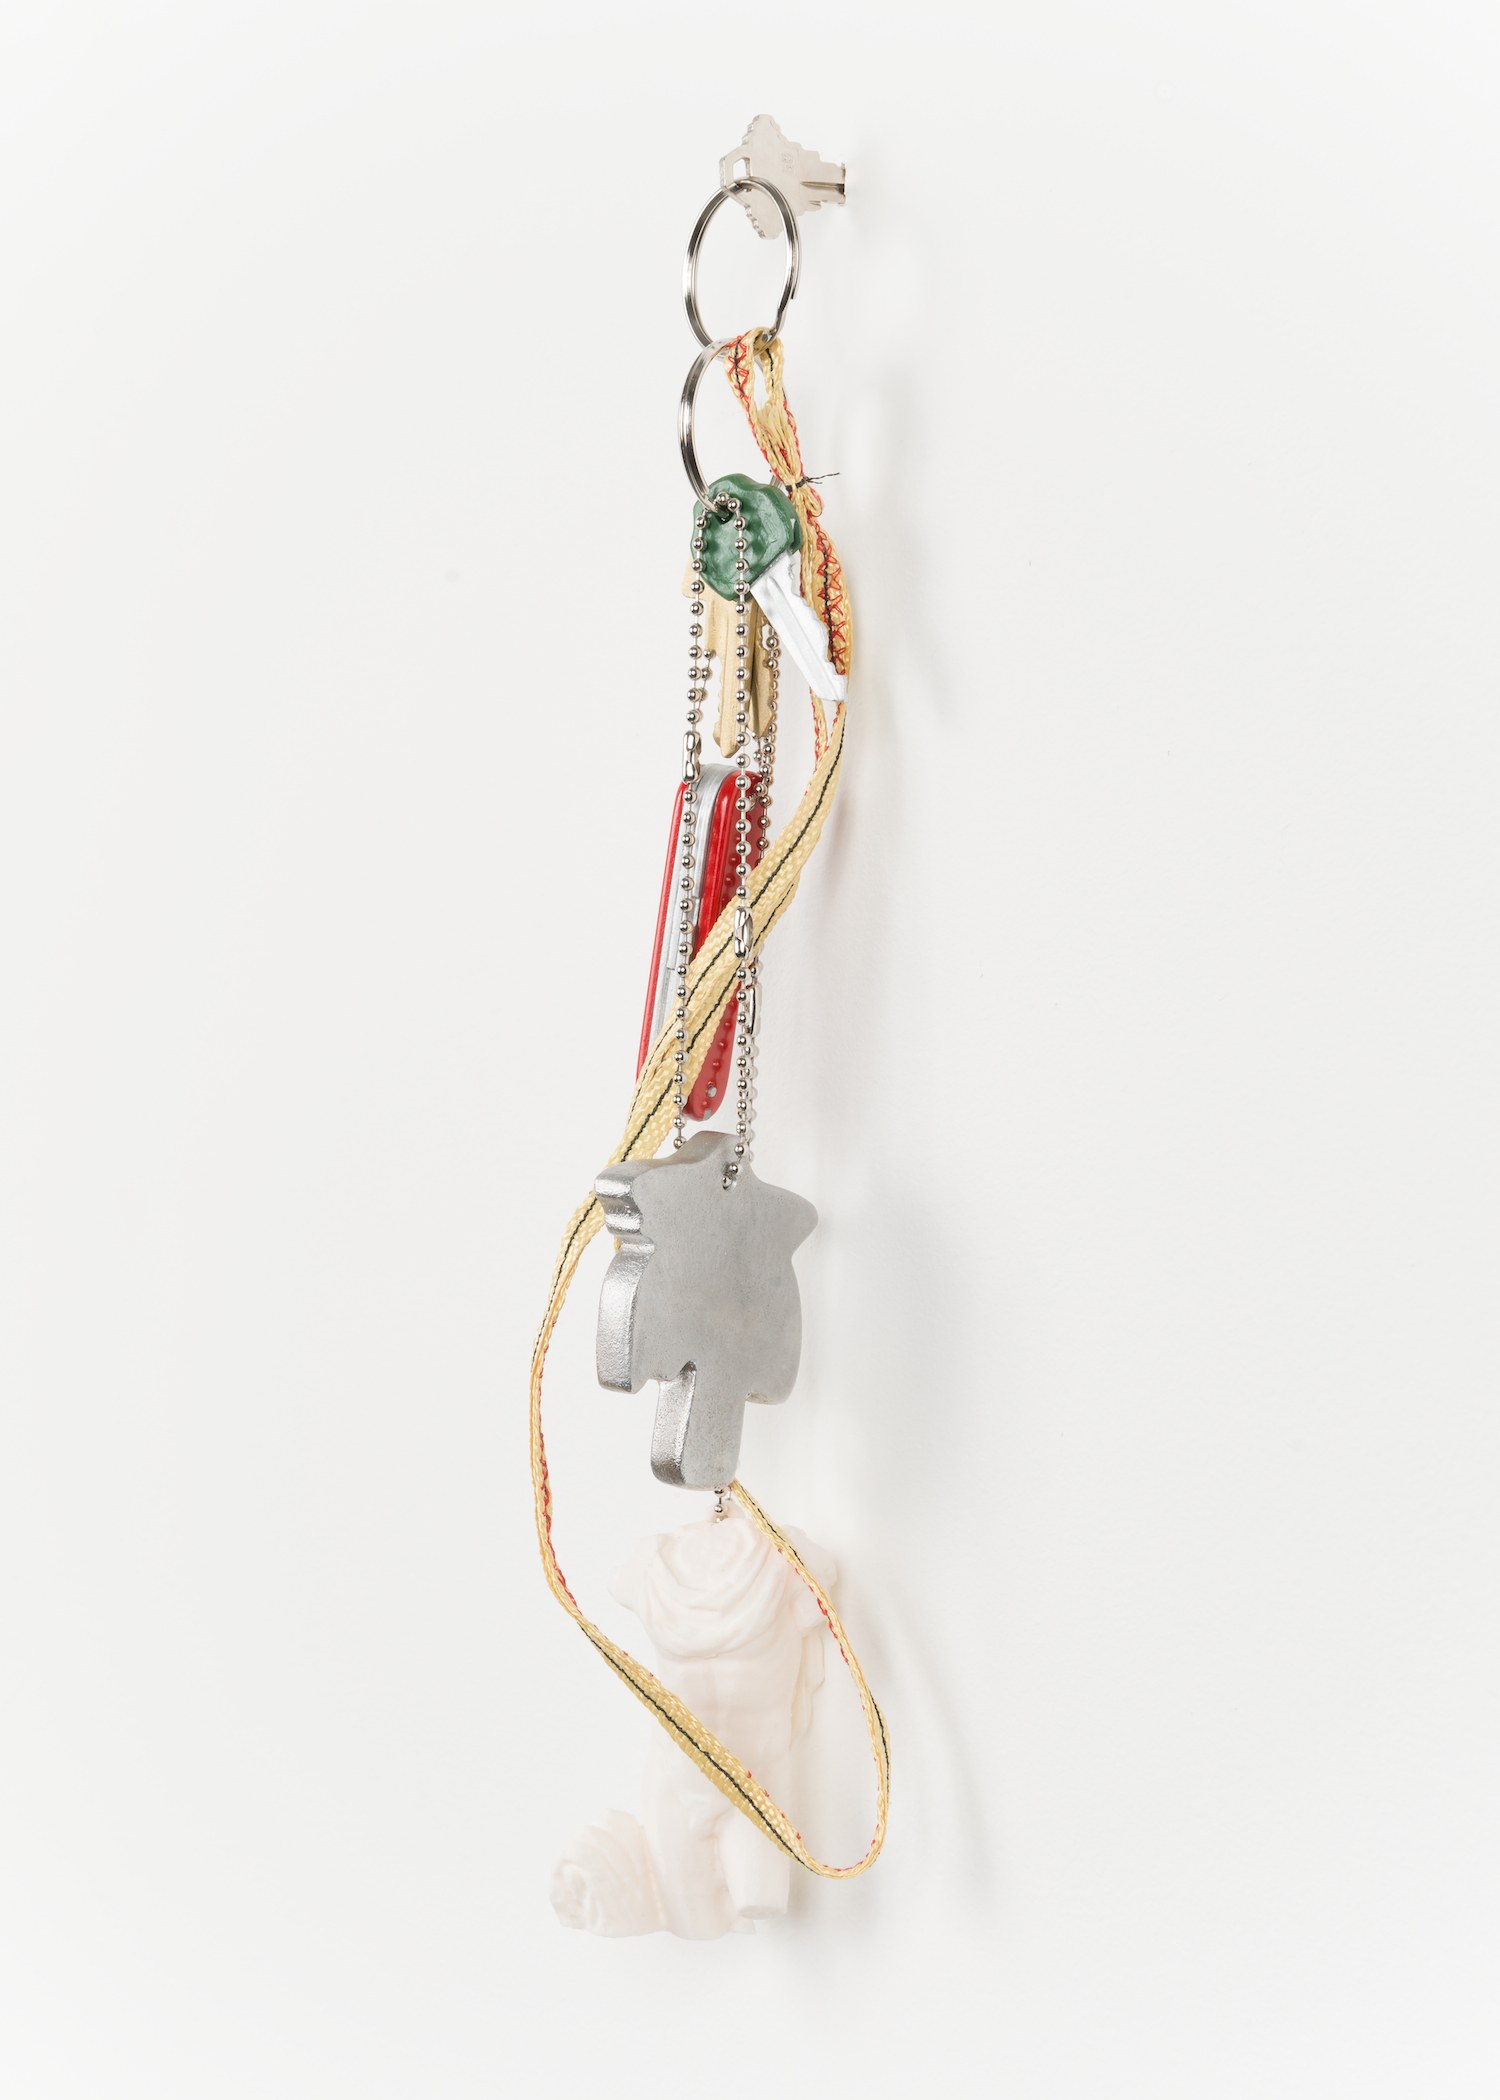 Chris Bradley  Token (Palm #2)  2013 Cast aluminum, wood, PLA, kevlar, key rings, chain 15h x 4w x 3d in CB055